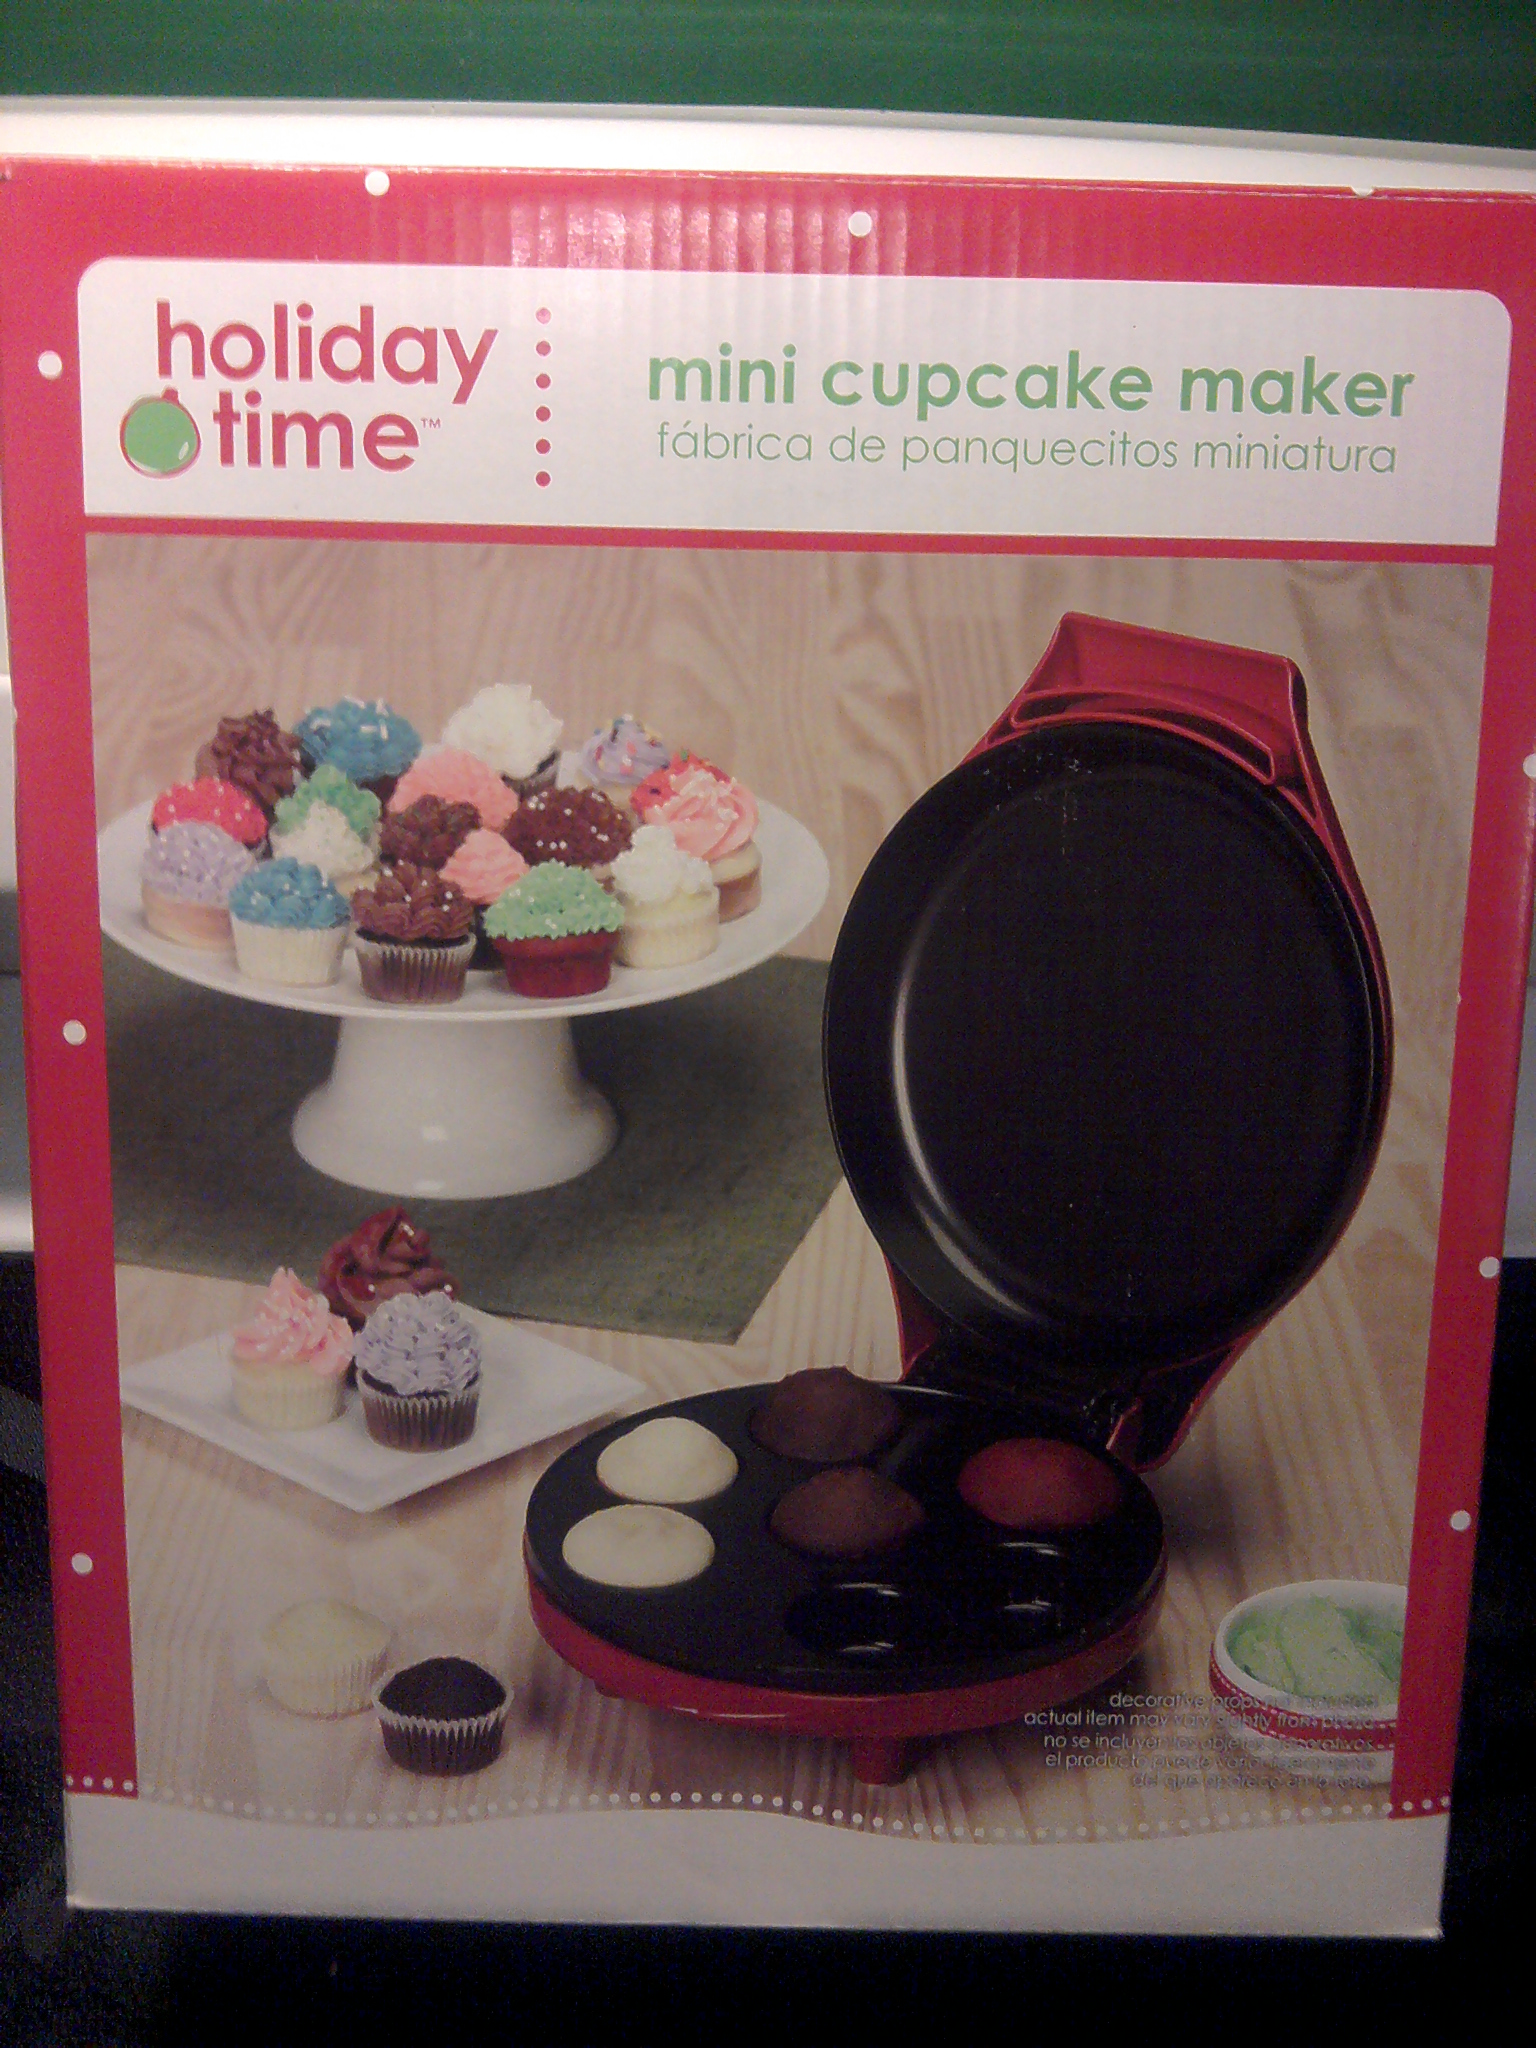 Mini cupcake maker katie cakes.